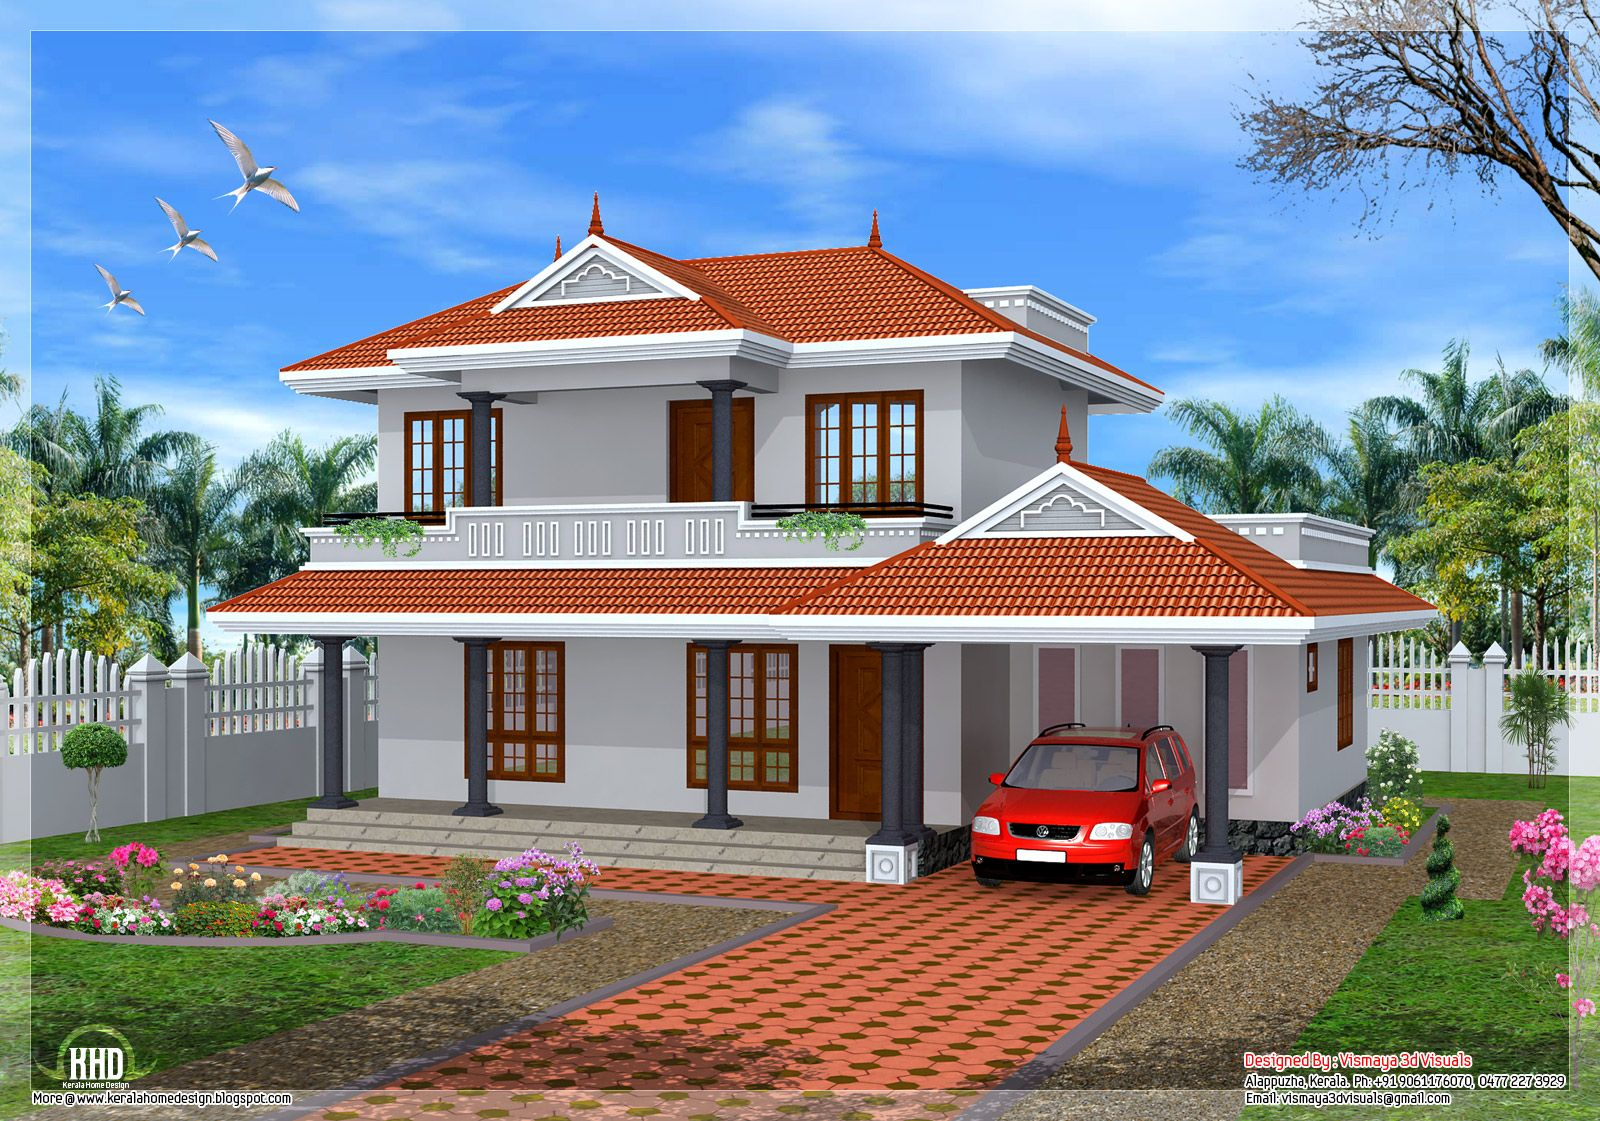 Architectural Design House Plans Kerala house design